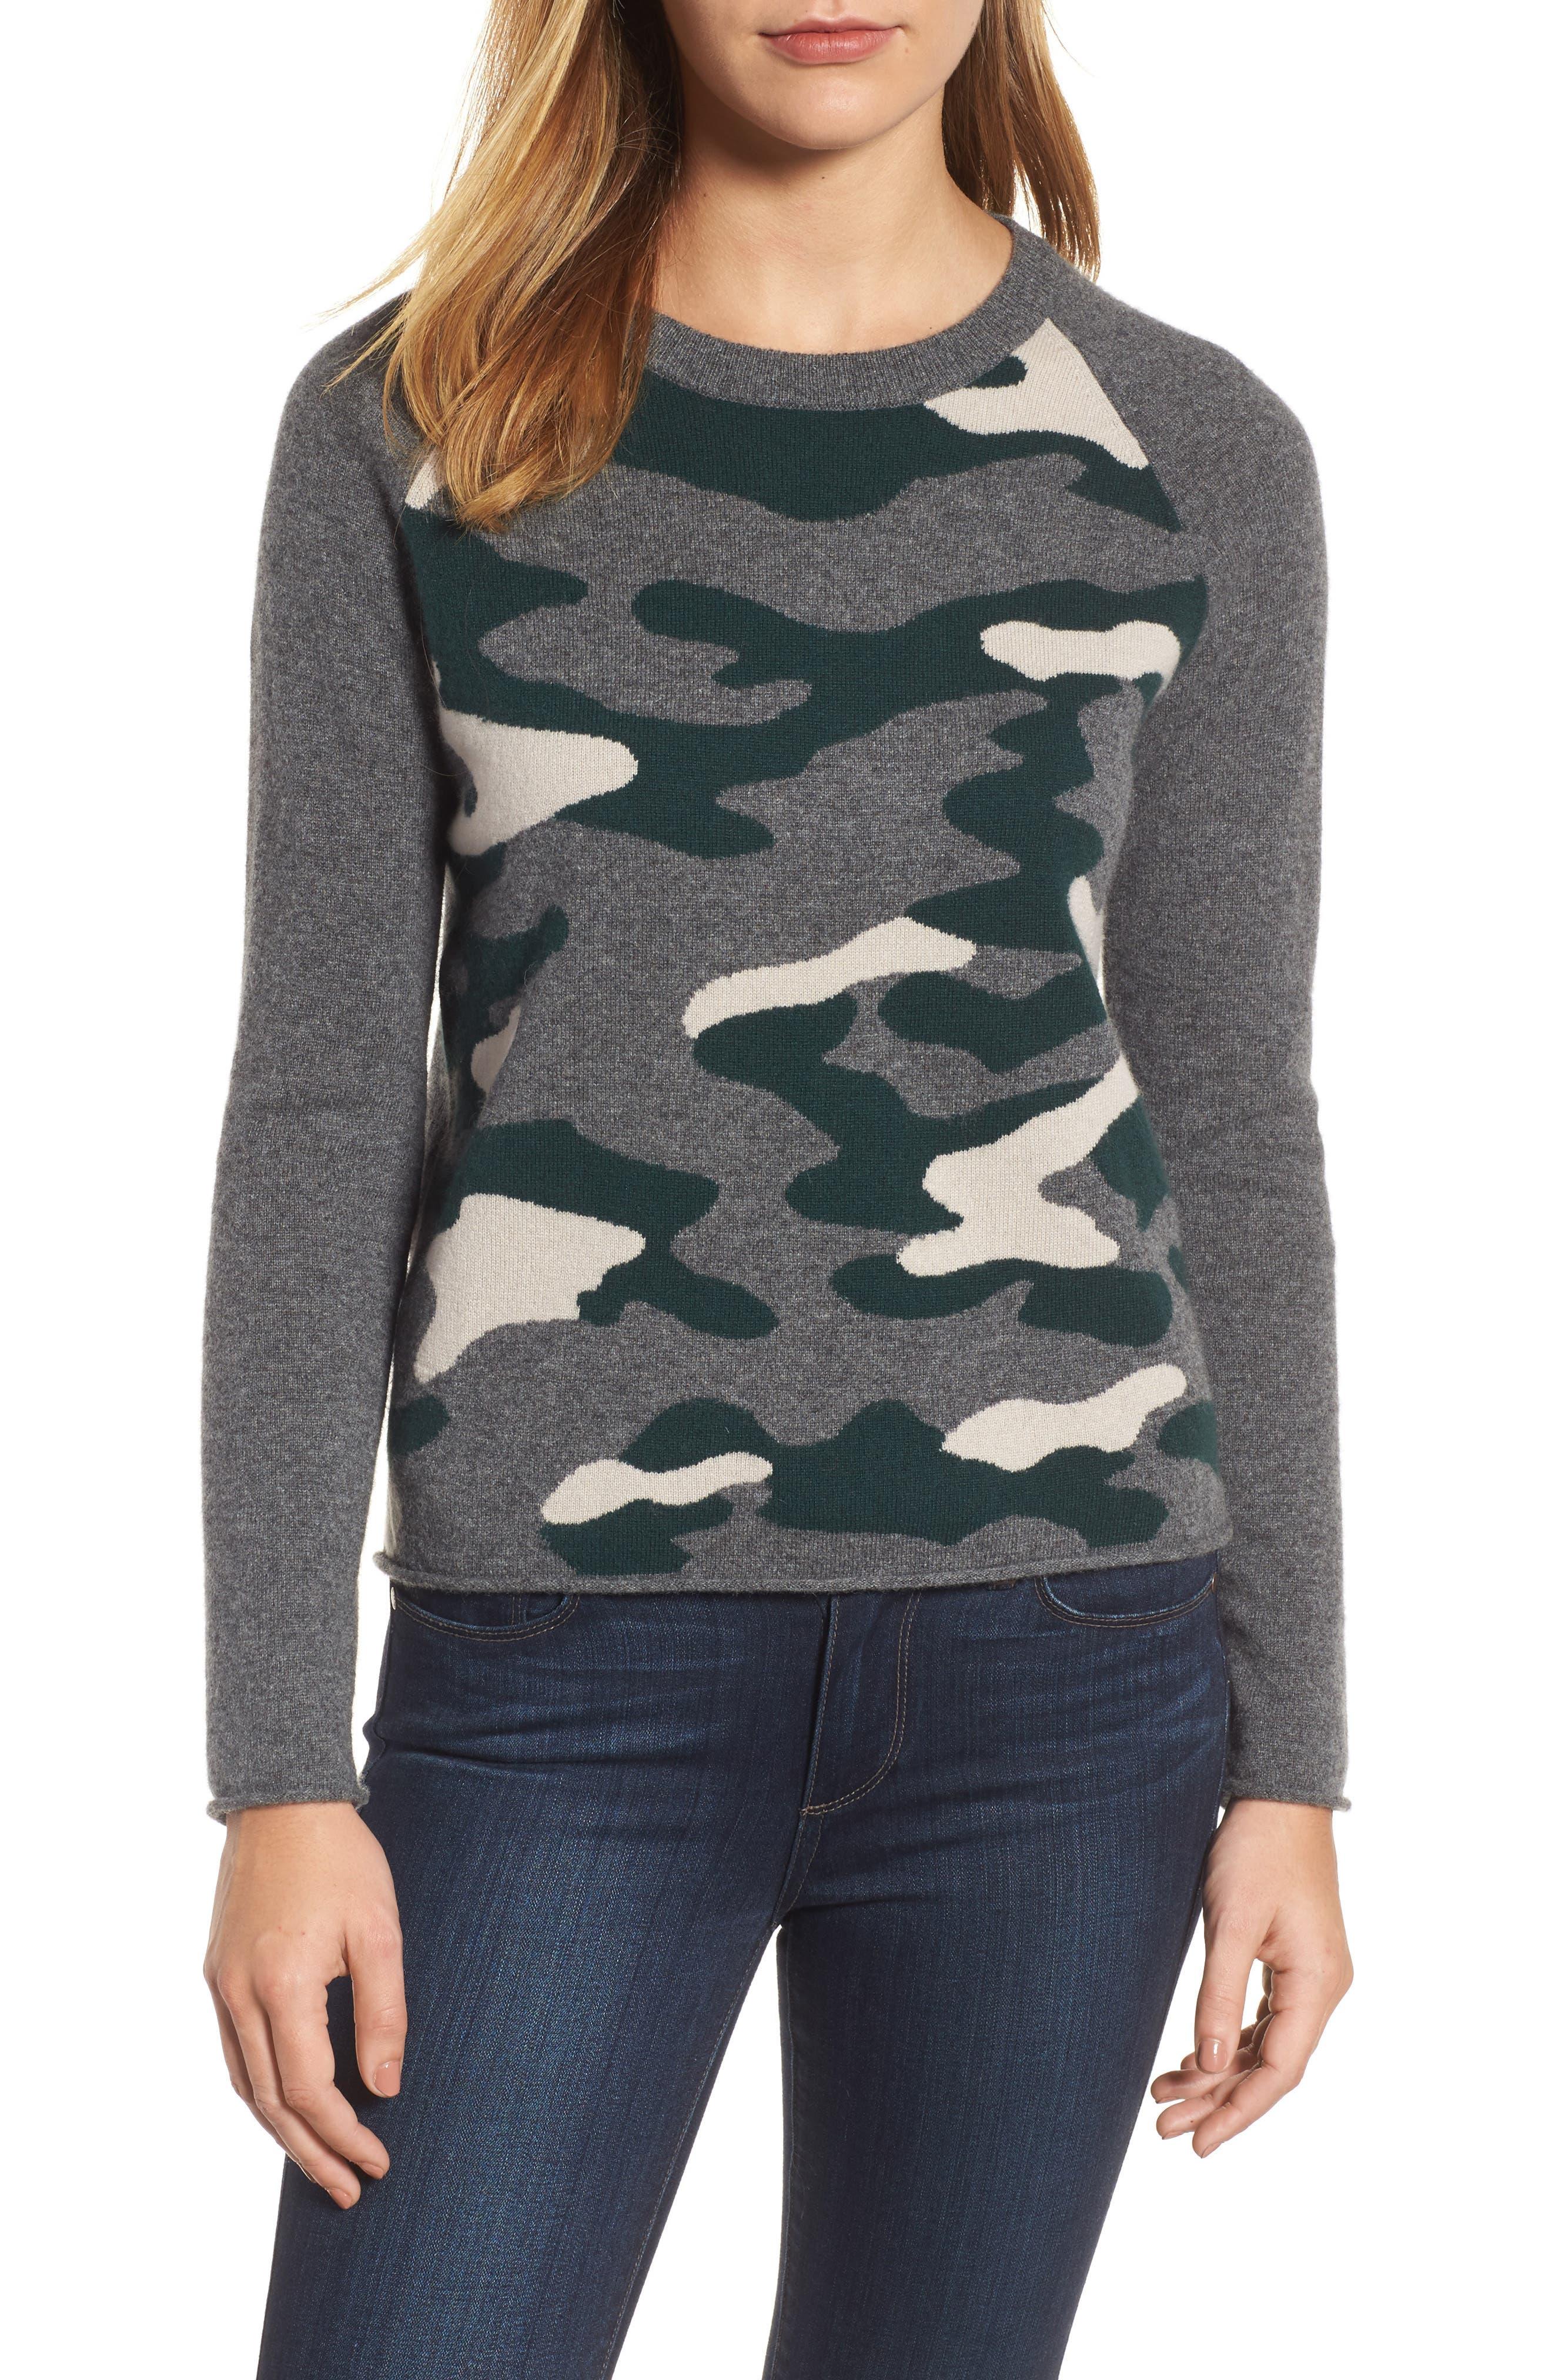 Velvet by Graham & Spencer Camo Cashmere Sweater